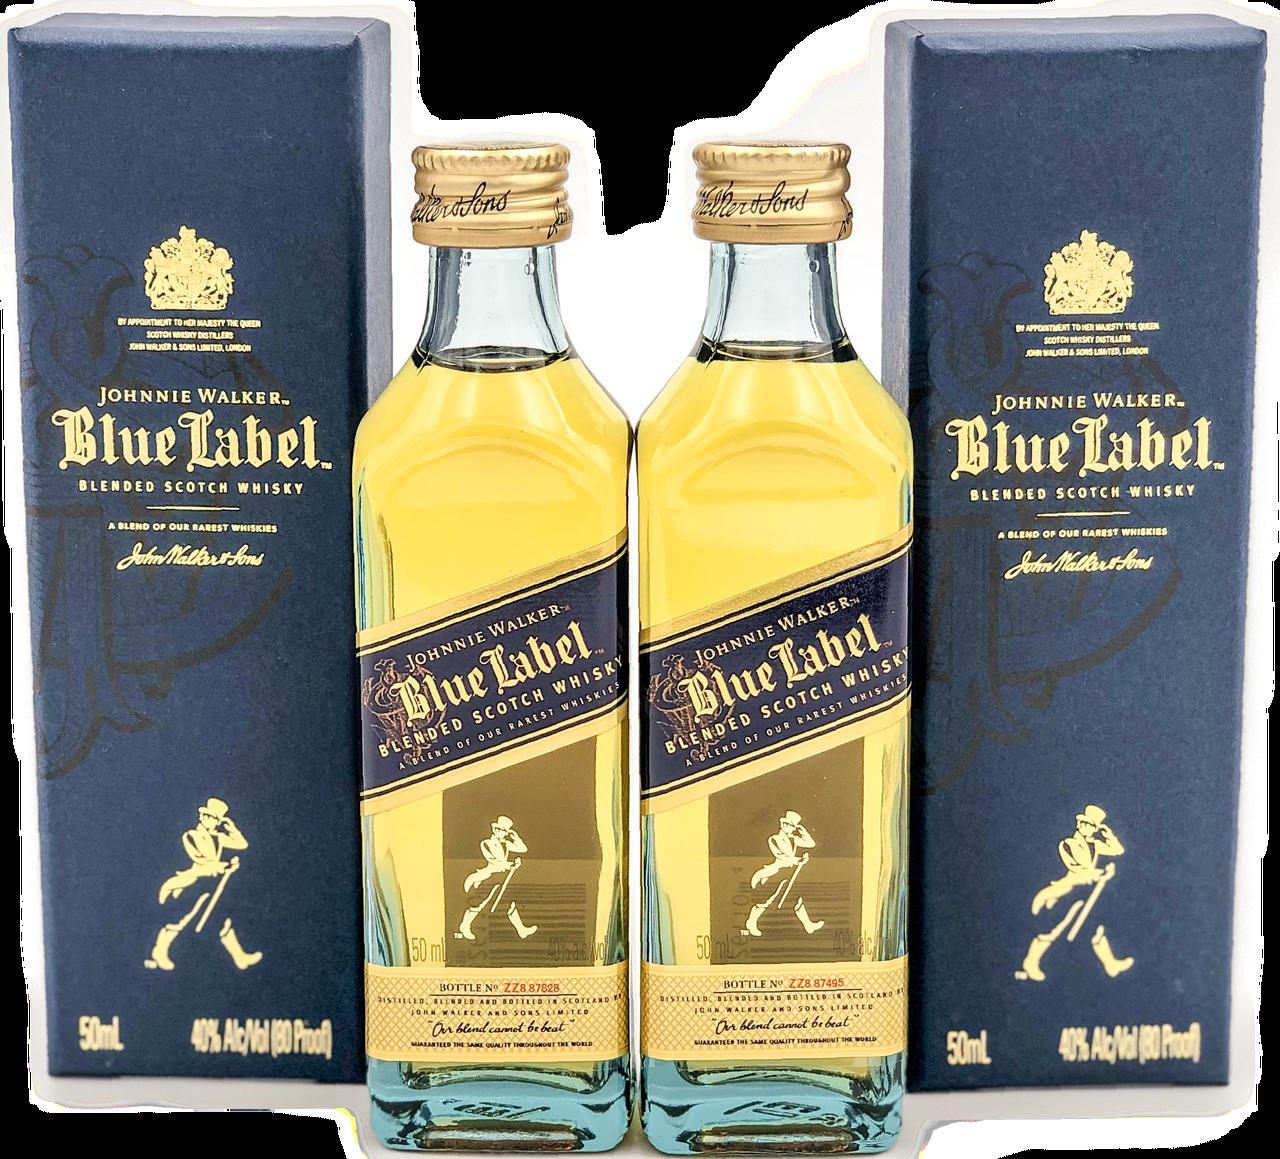 Johnnie Walker Blue Label Scotch Whisky 50ml Mini Bottles Set - Old Town Tequila